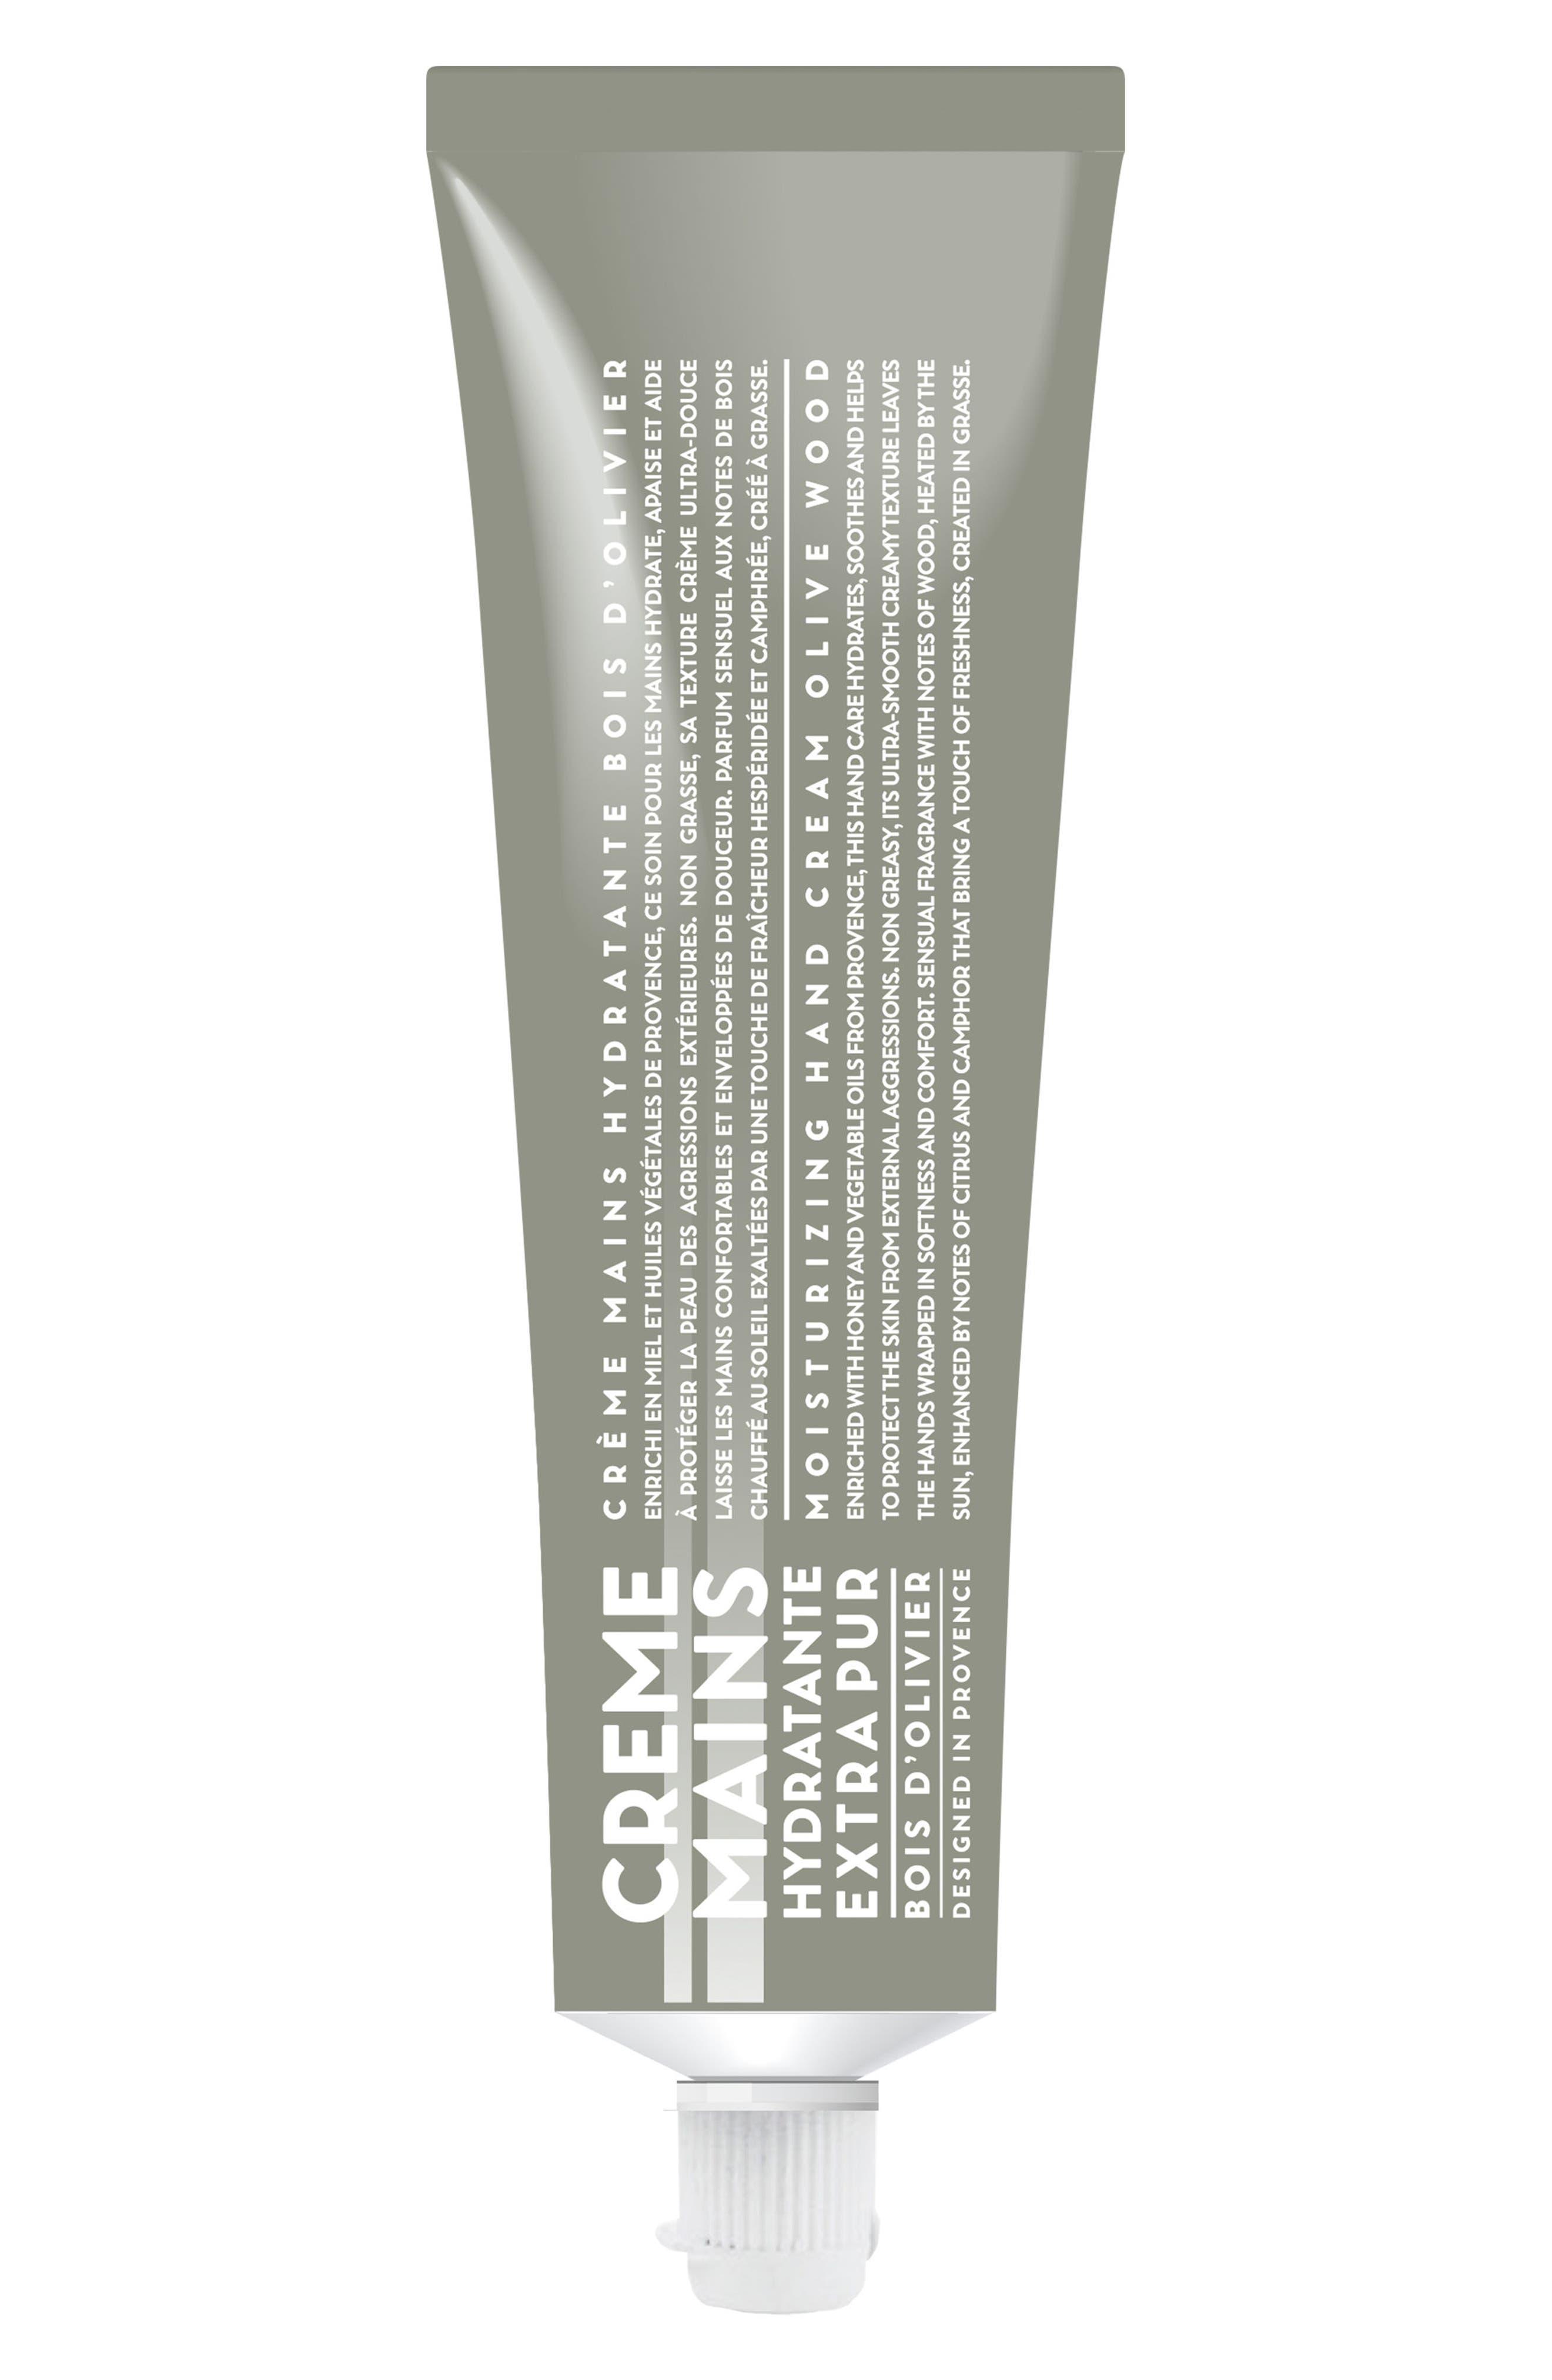 COMPAGNIE DE PROVENCE Olive Wood Moisturizing Hand Cream